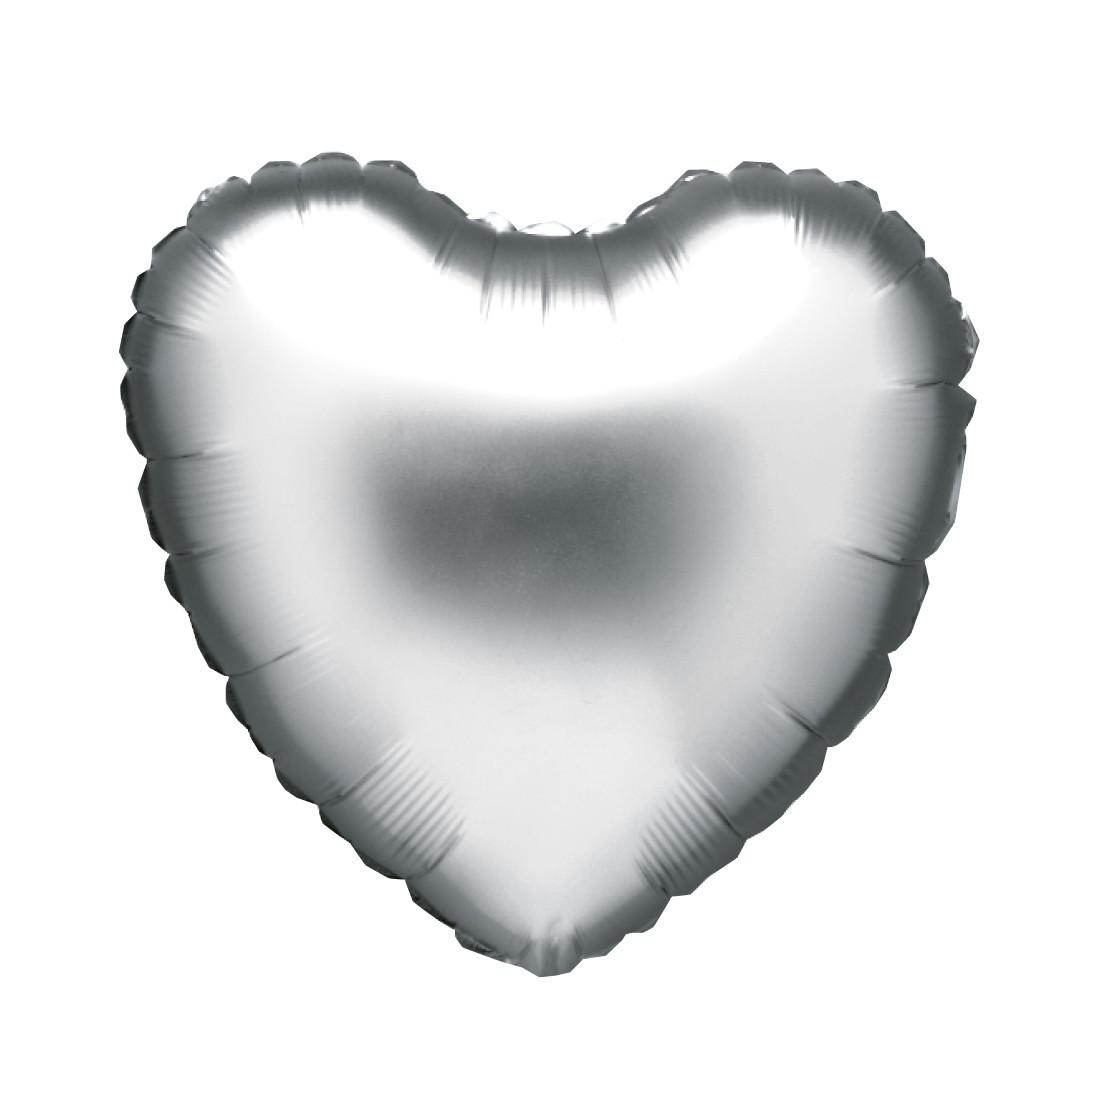 "HERZ SILBER 46 CM / HEART SILVER 18"""